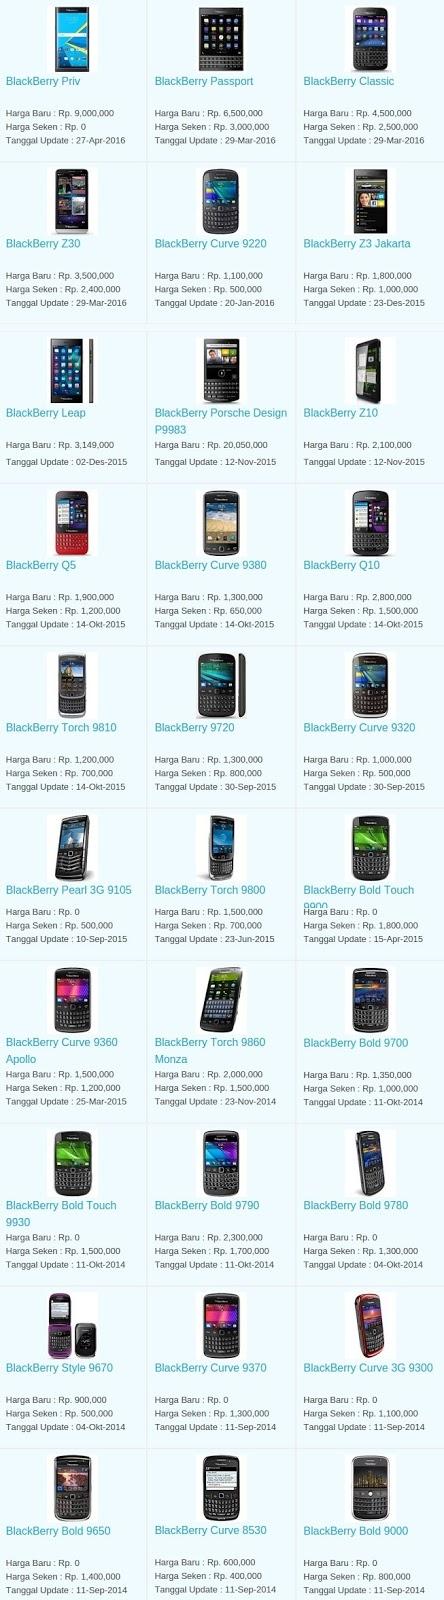 Daftar Harga Hp Terbaru Blackberry Mei 2016